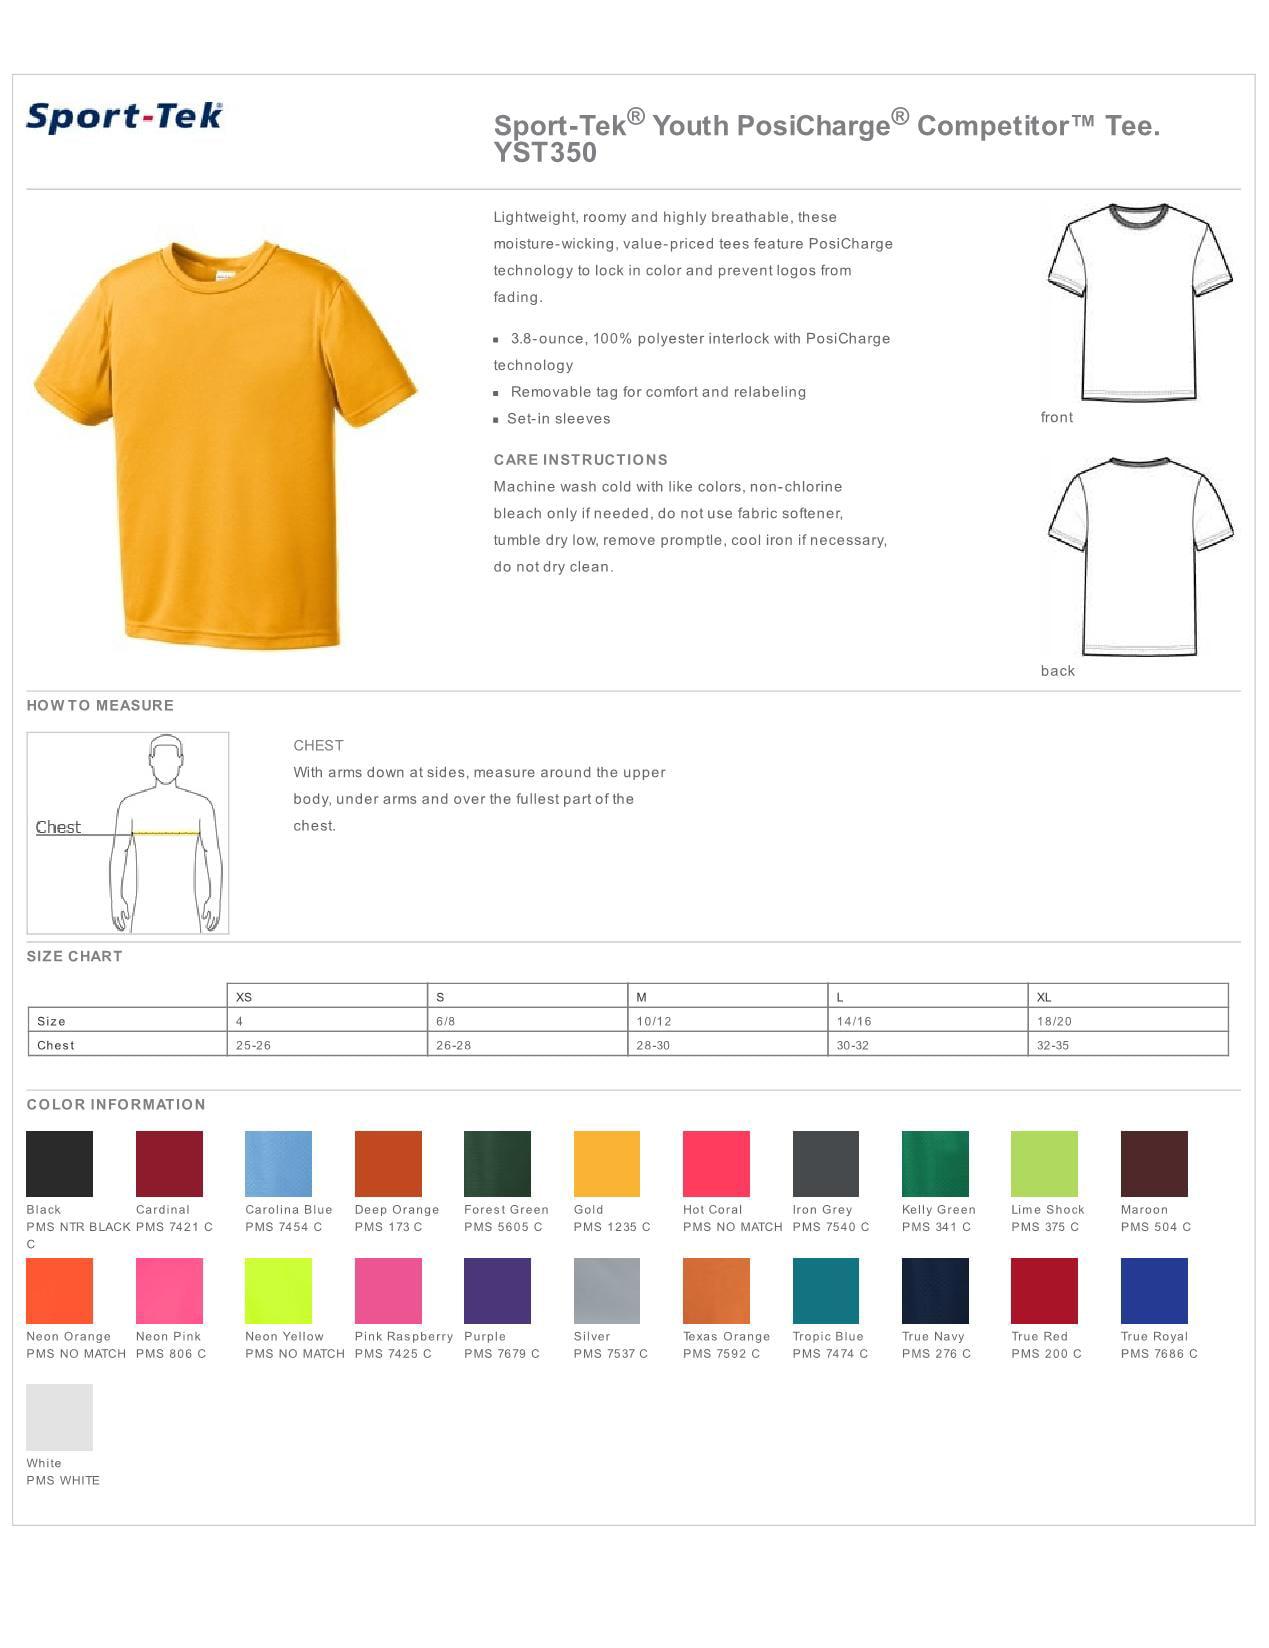 Sport-Tek Boys Competitor Polyester Casual Short Sleeve T-Shirt 6-Pack YST350